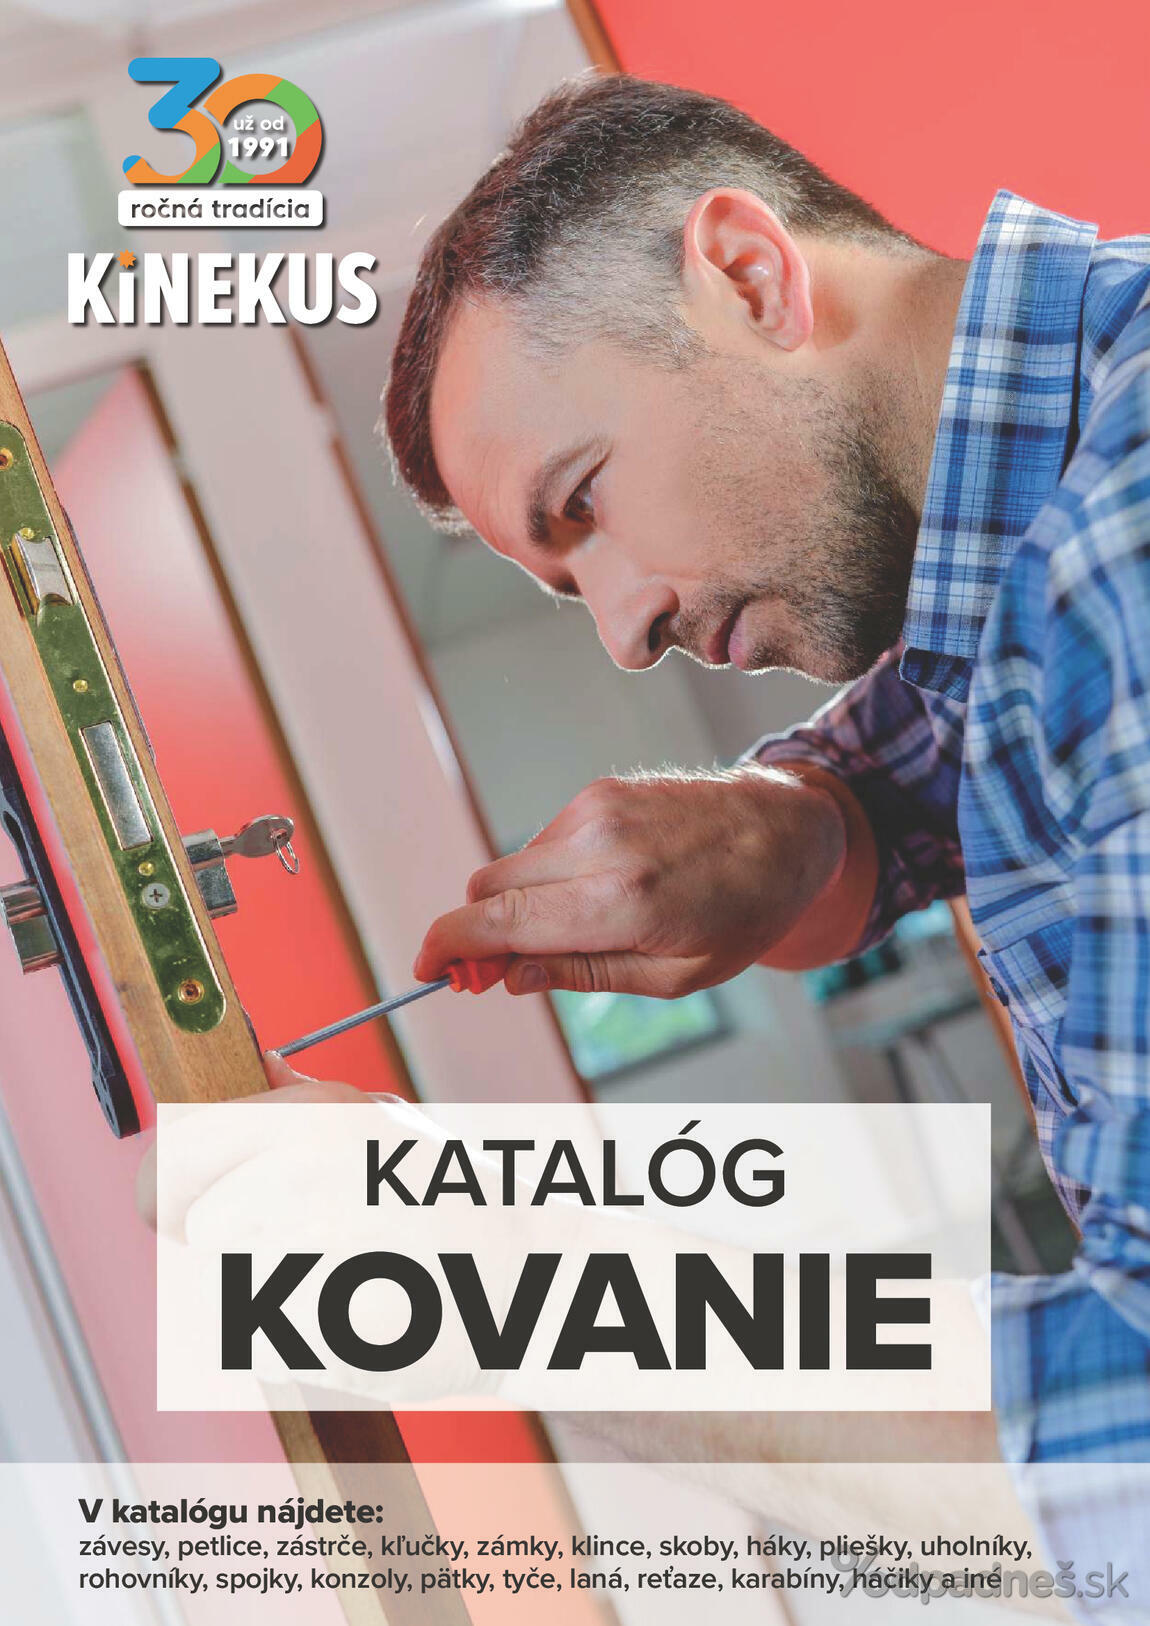 1. stránka Kinekus letáku